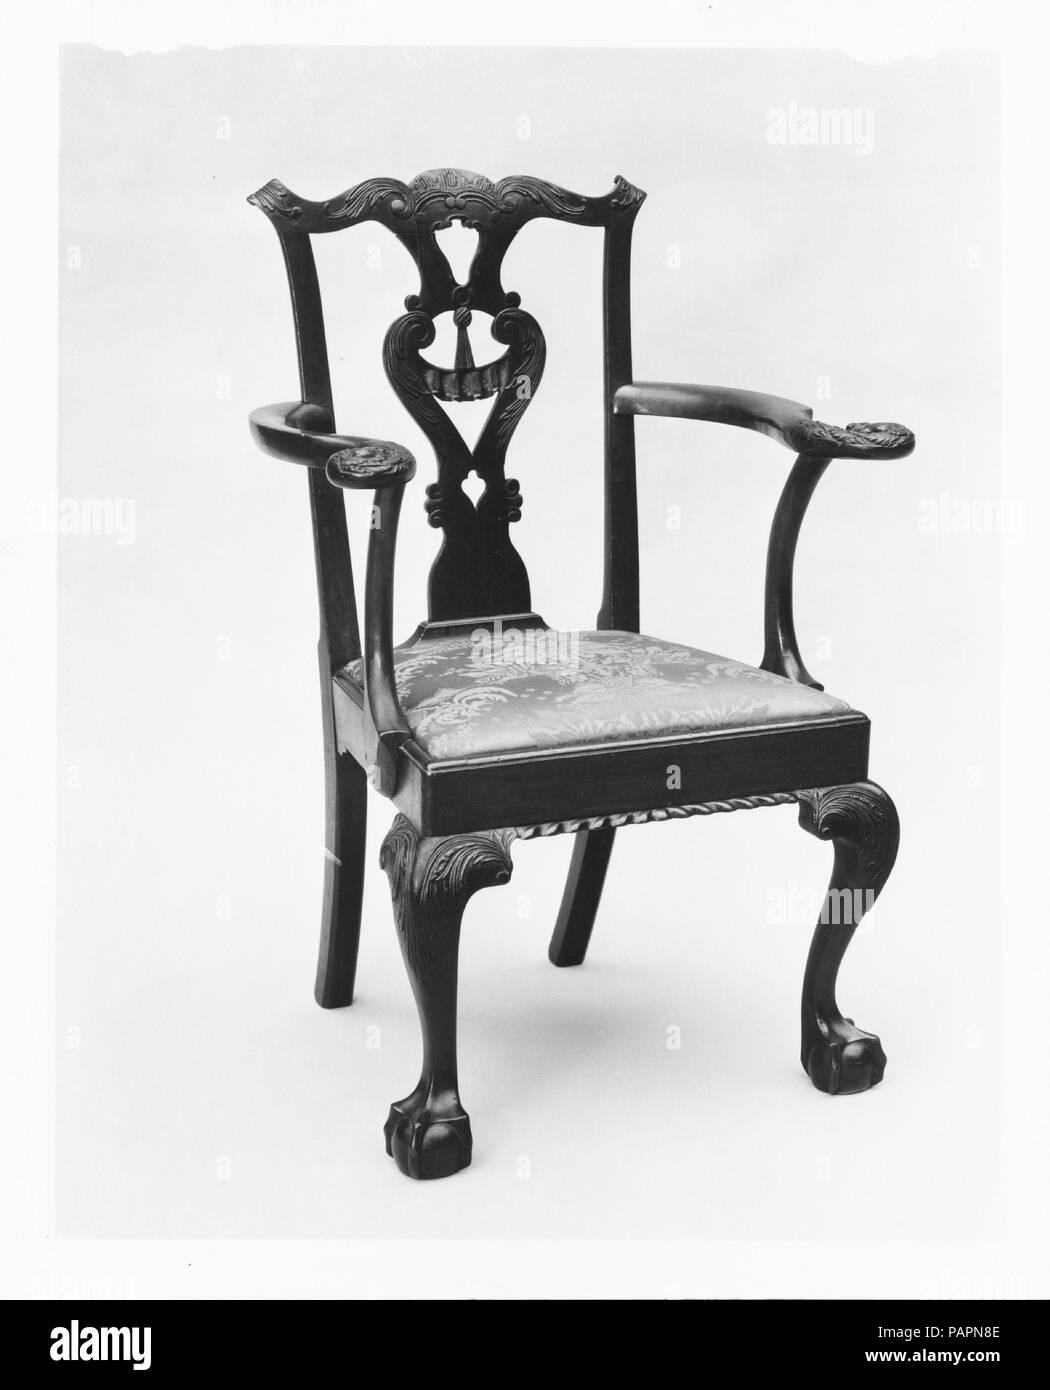 Armchair. Culture: American. Dimensions: 39 1/8 x 20 7/8 x 22 in. (99.4 x 53 x 55.9 cm). Date: 1755-75. Museum: Metropolitan Museum of Art, New York, USA. - Stock Image